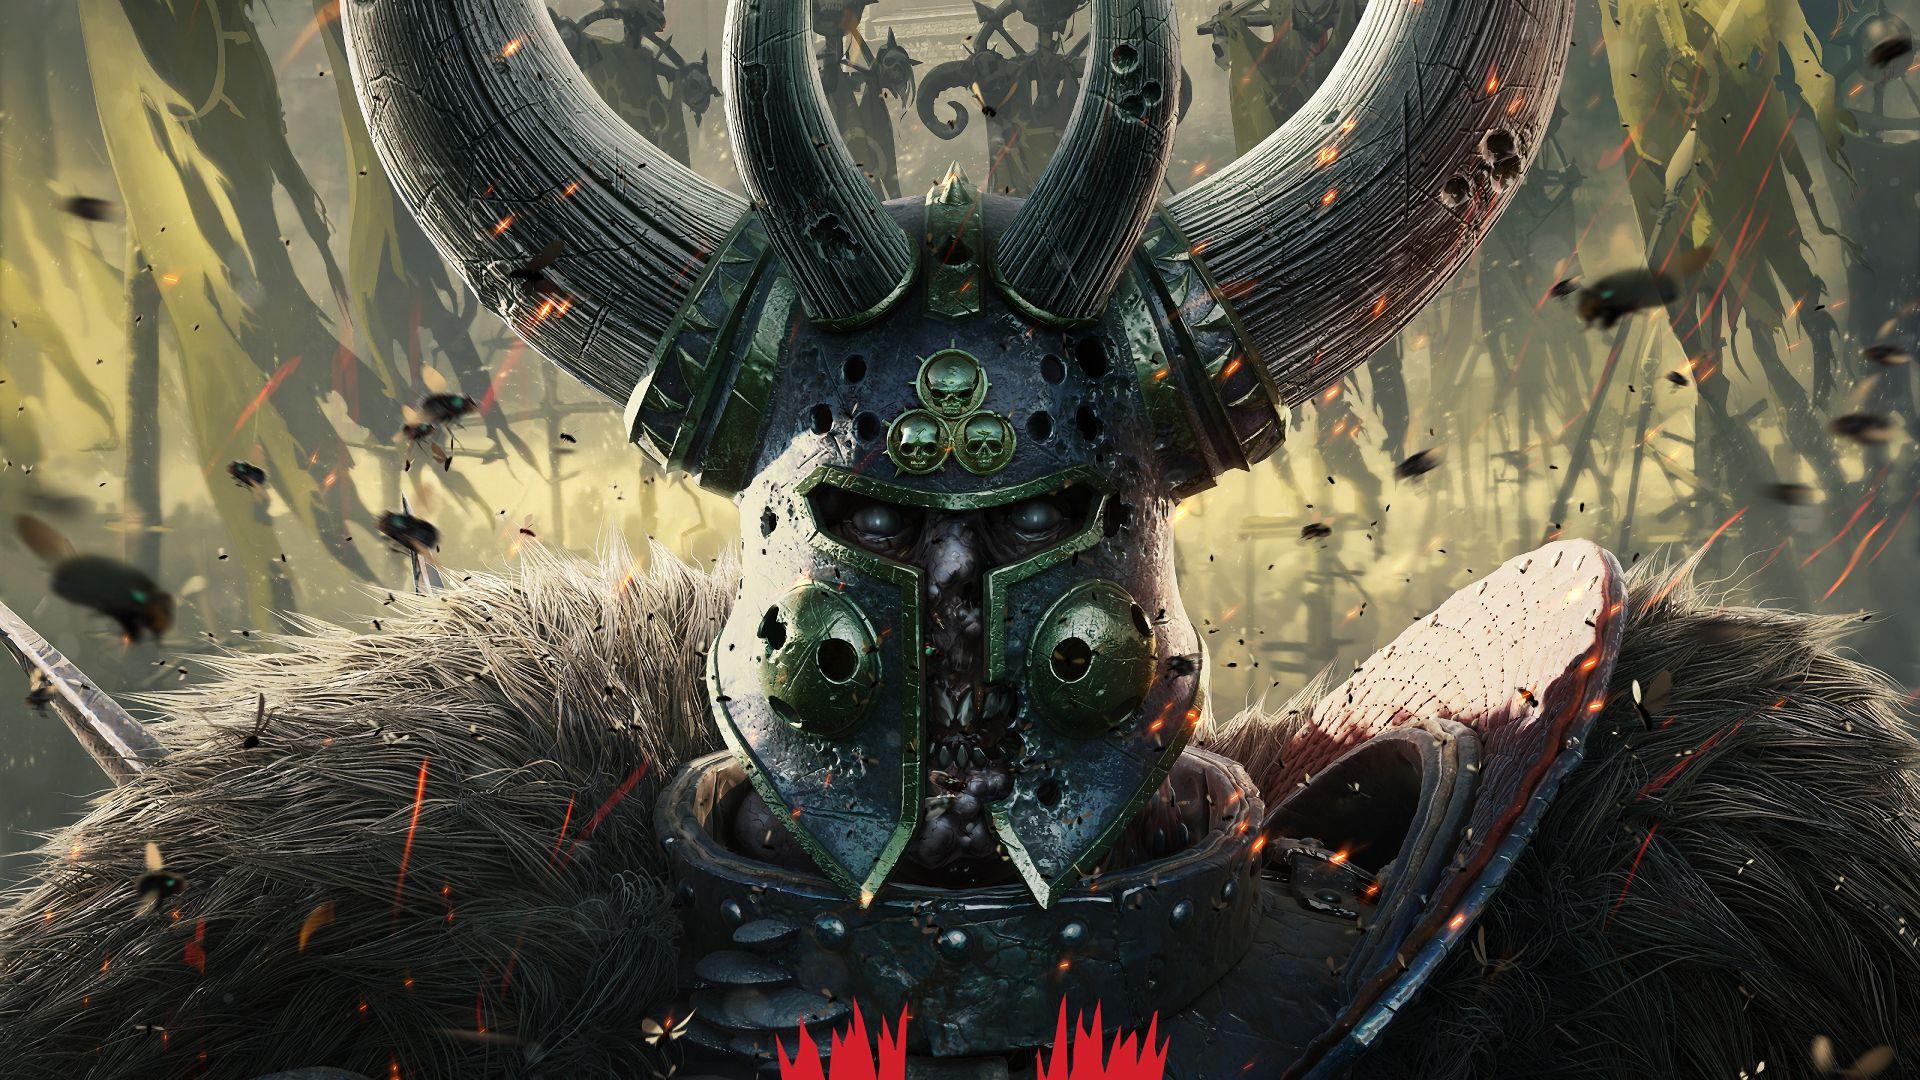 Wallpaper The Evil Within 2 4k E3 2017 Games 7883: Wallpaper Warhammer: Vermintide 2, Screenshot, 4k, Games